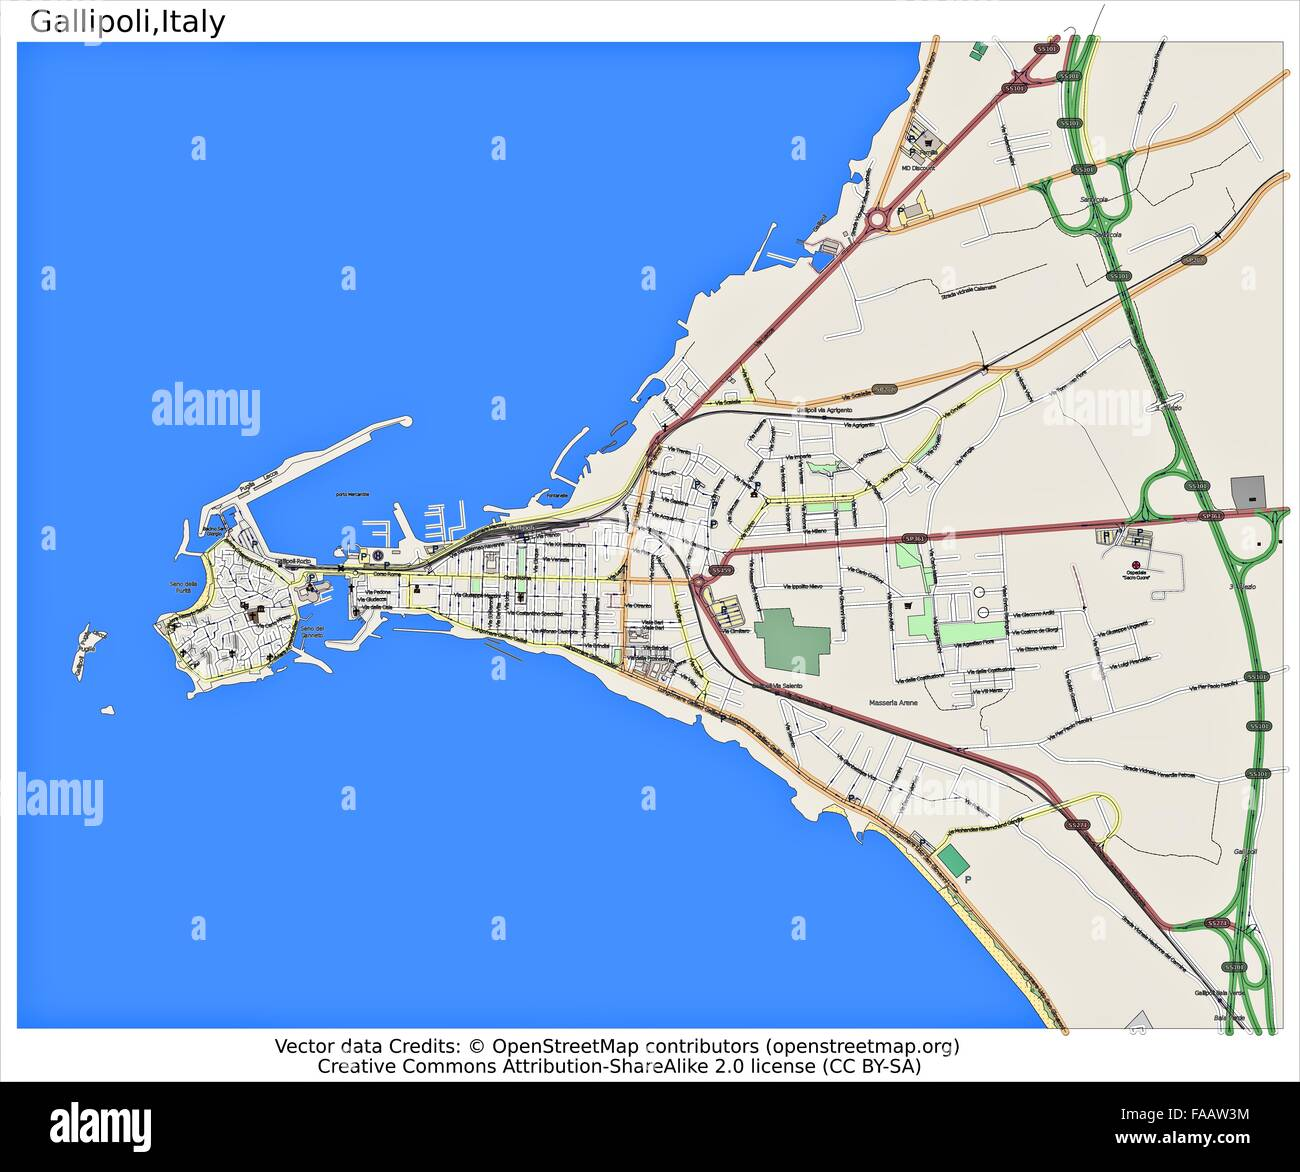 Gallipoli italy city map stock photo 92437624 alamy gallipoli italy city map thecheapjerseys Choice Image